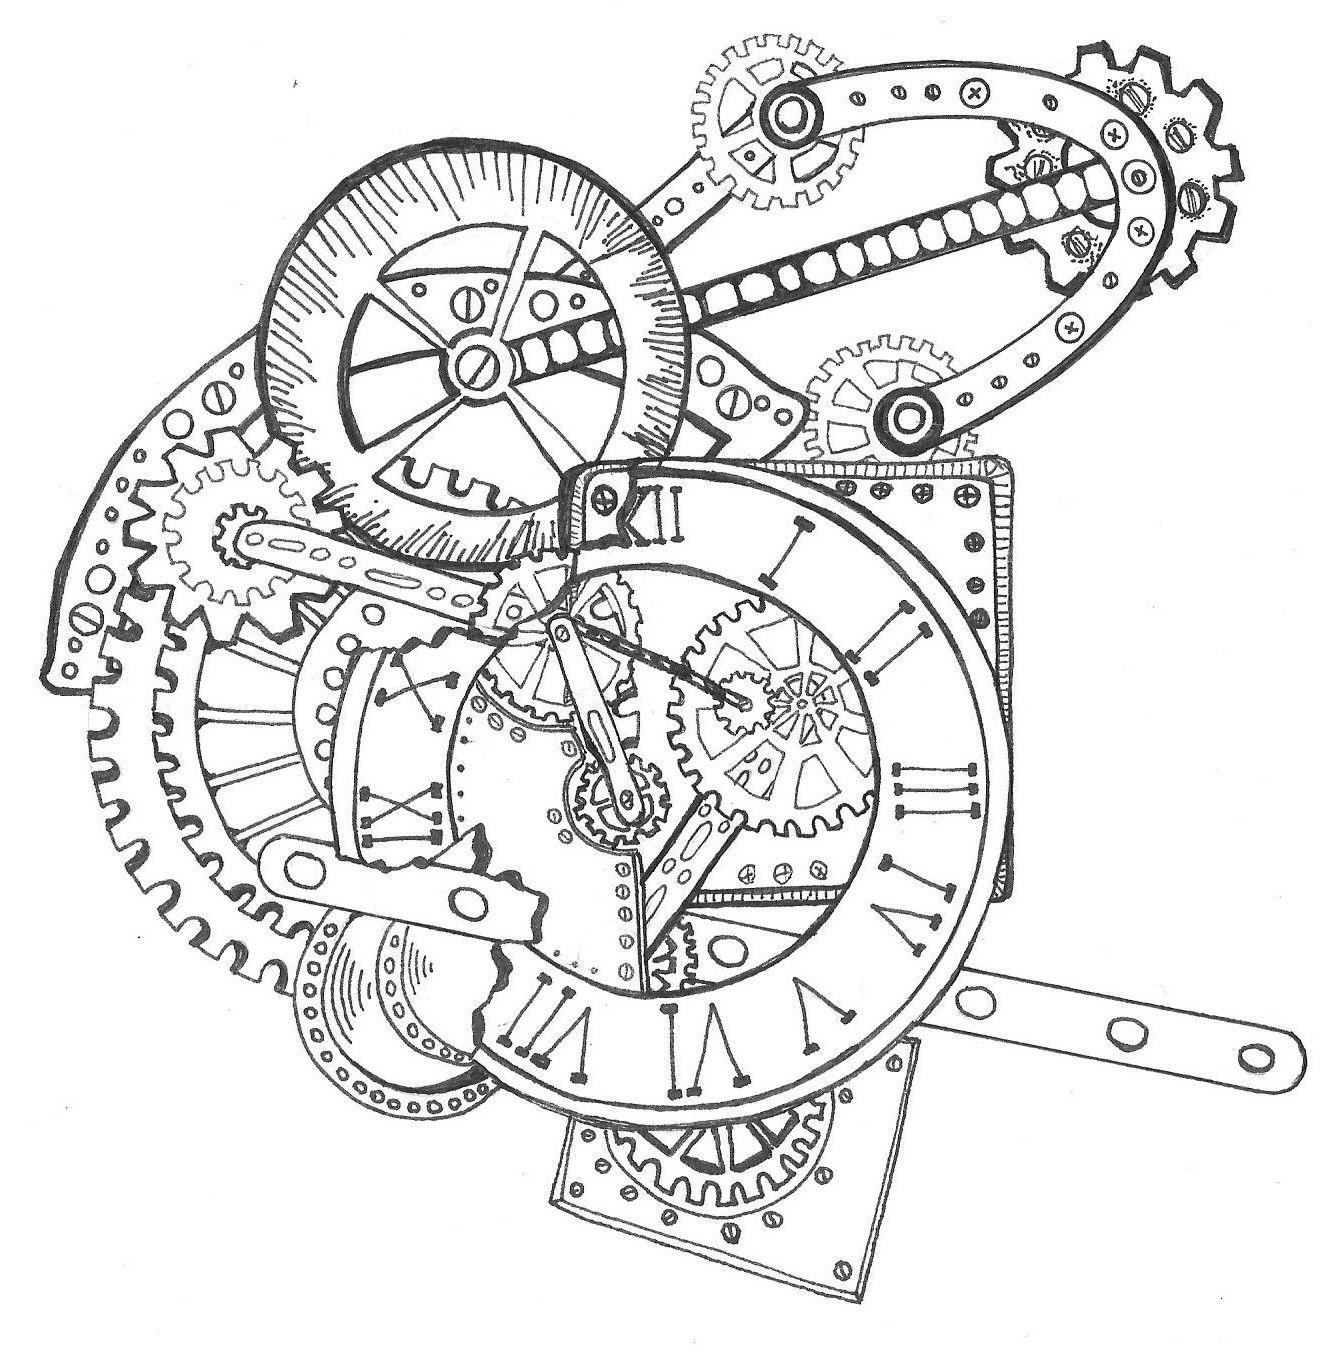 Zentangle Steampunk Clock drawn by Sherry Long November